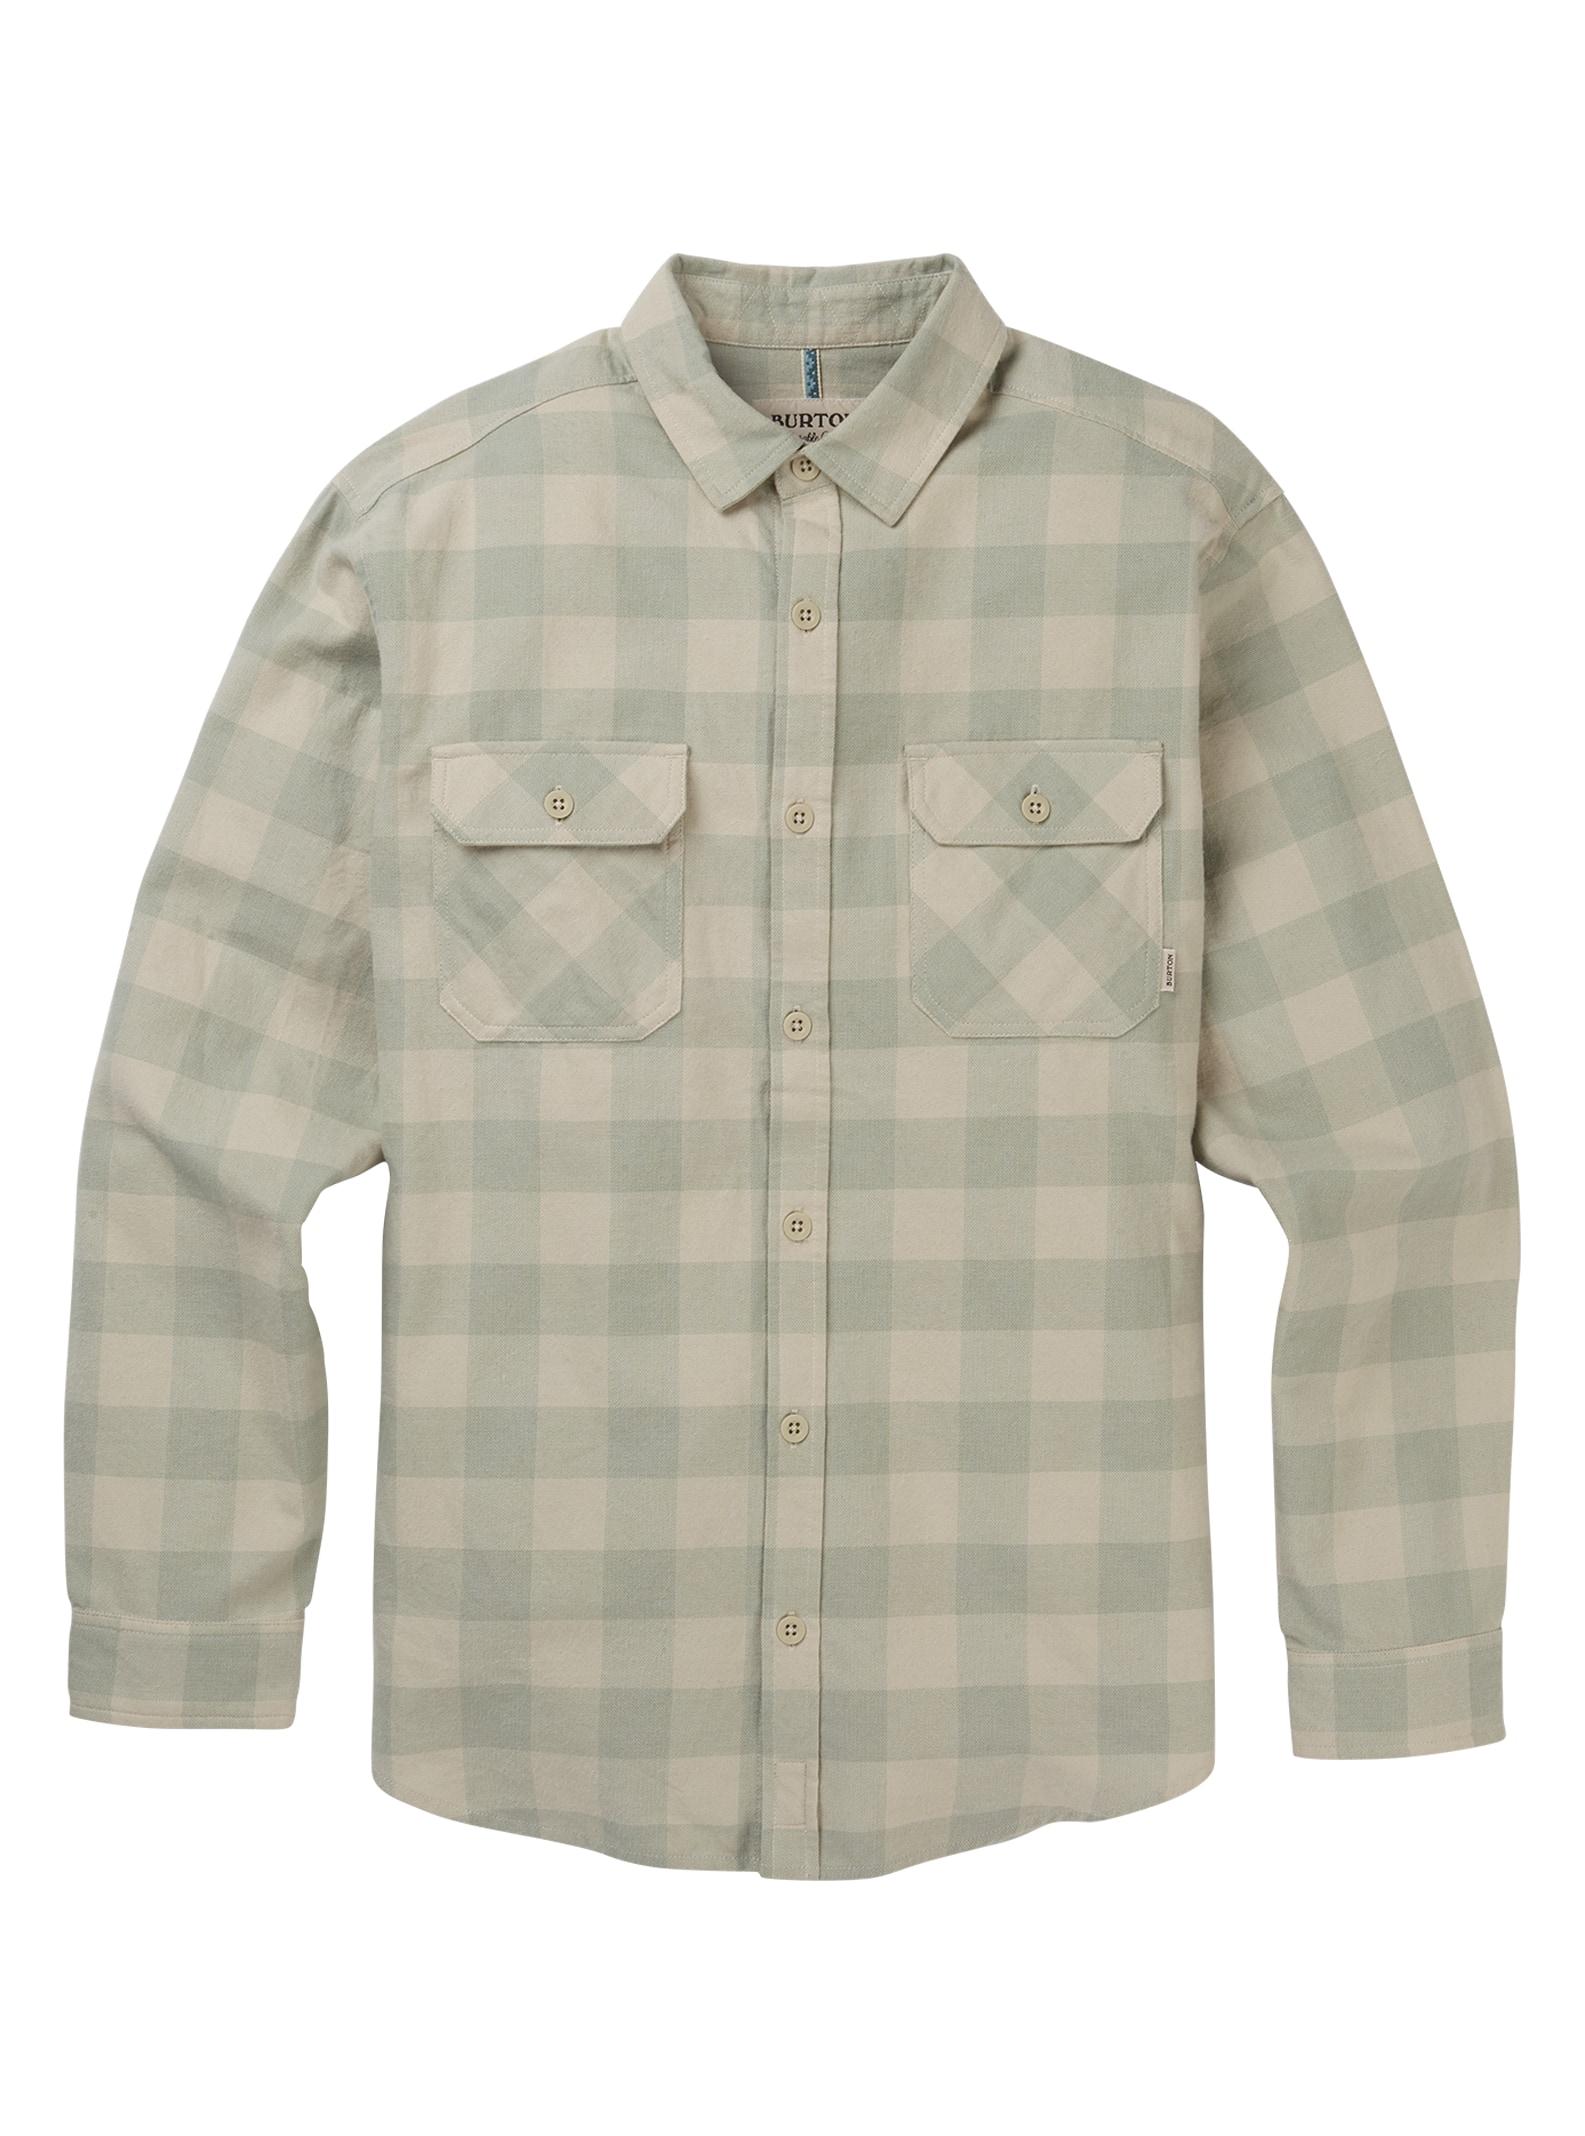 add7a695 Men's Shirts & Flannels | Burton Snowboards